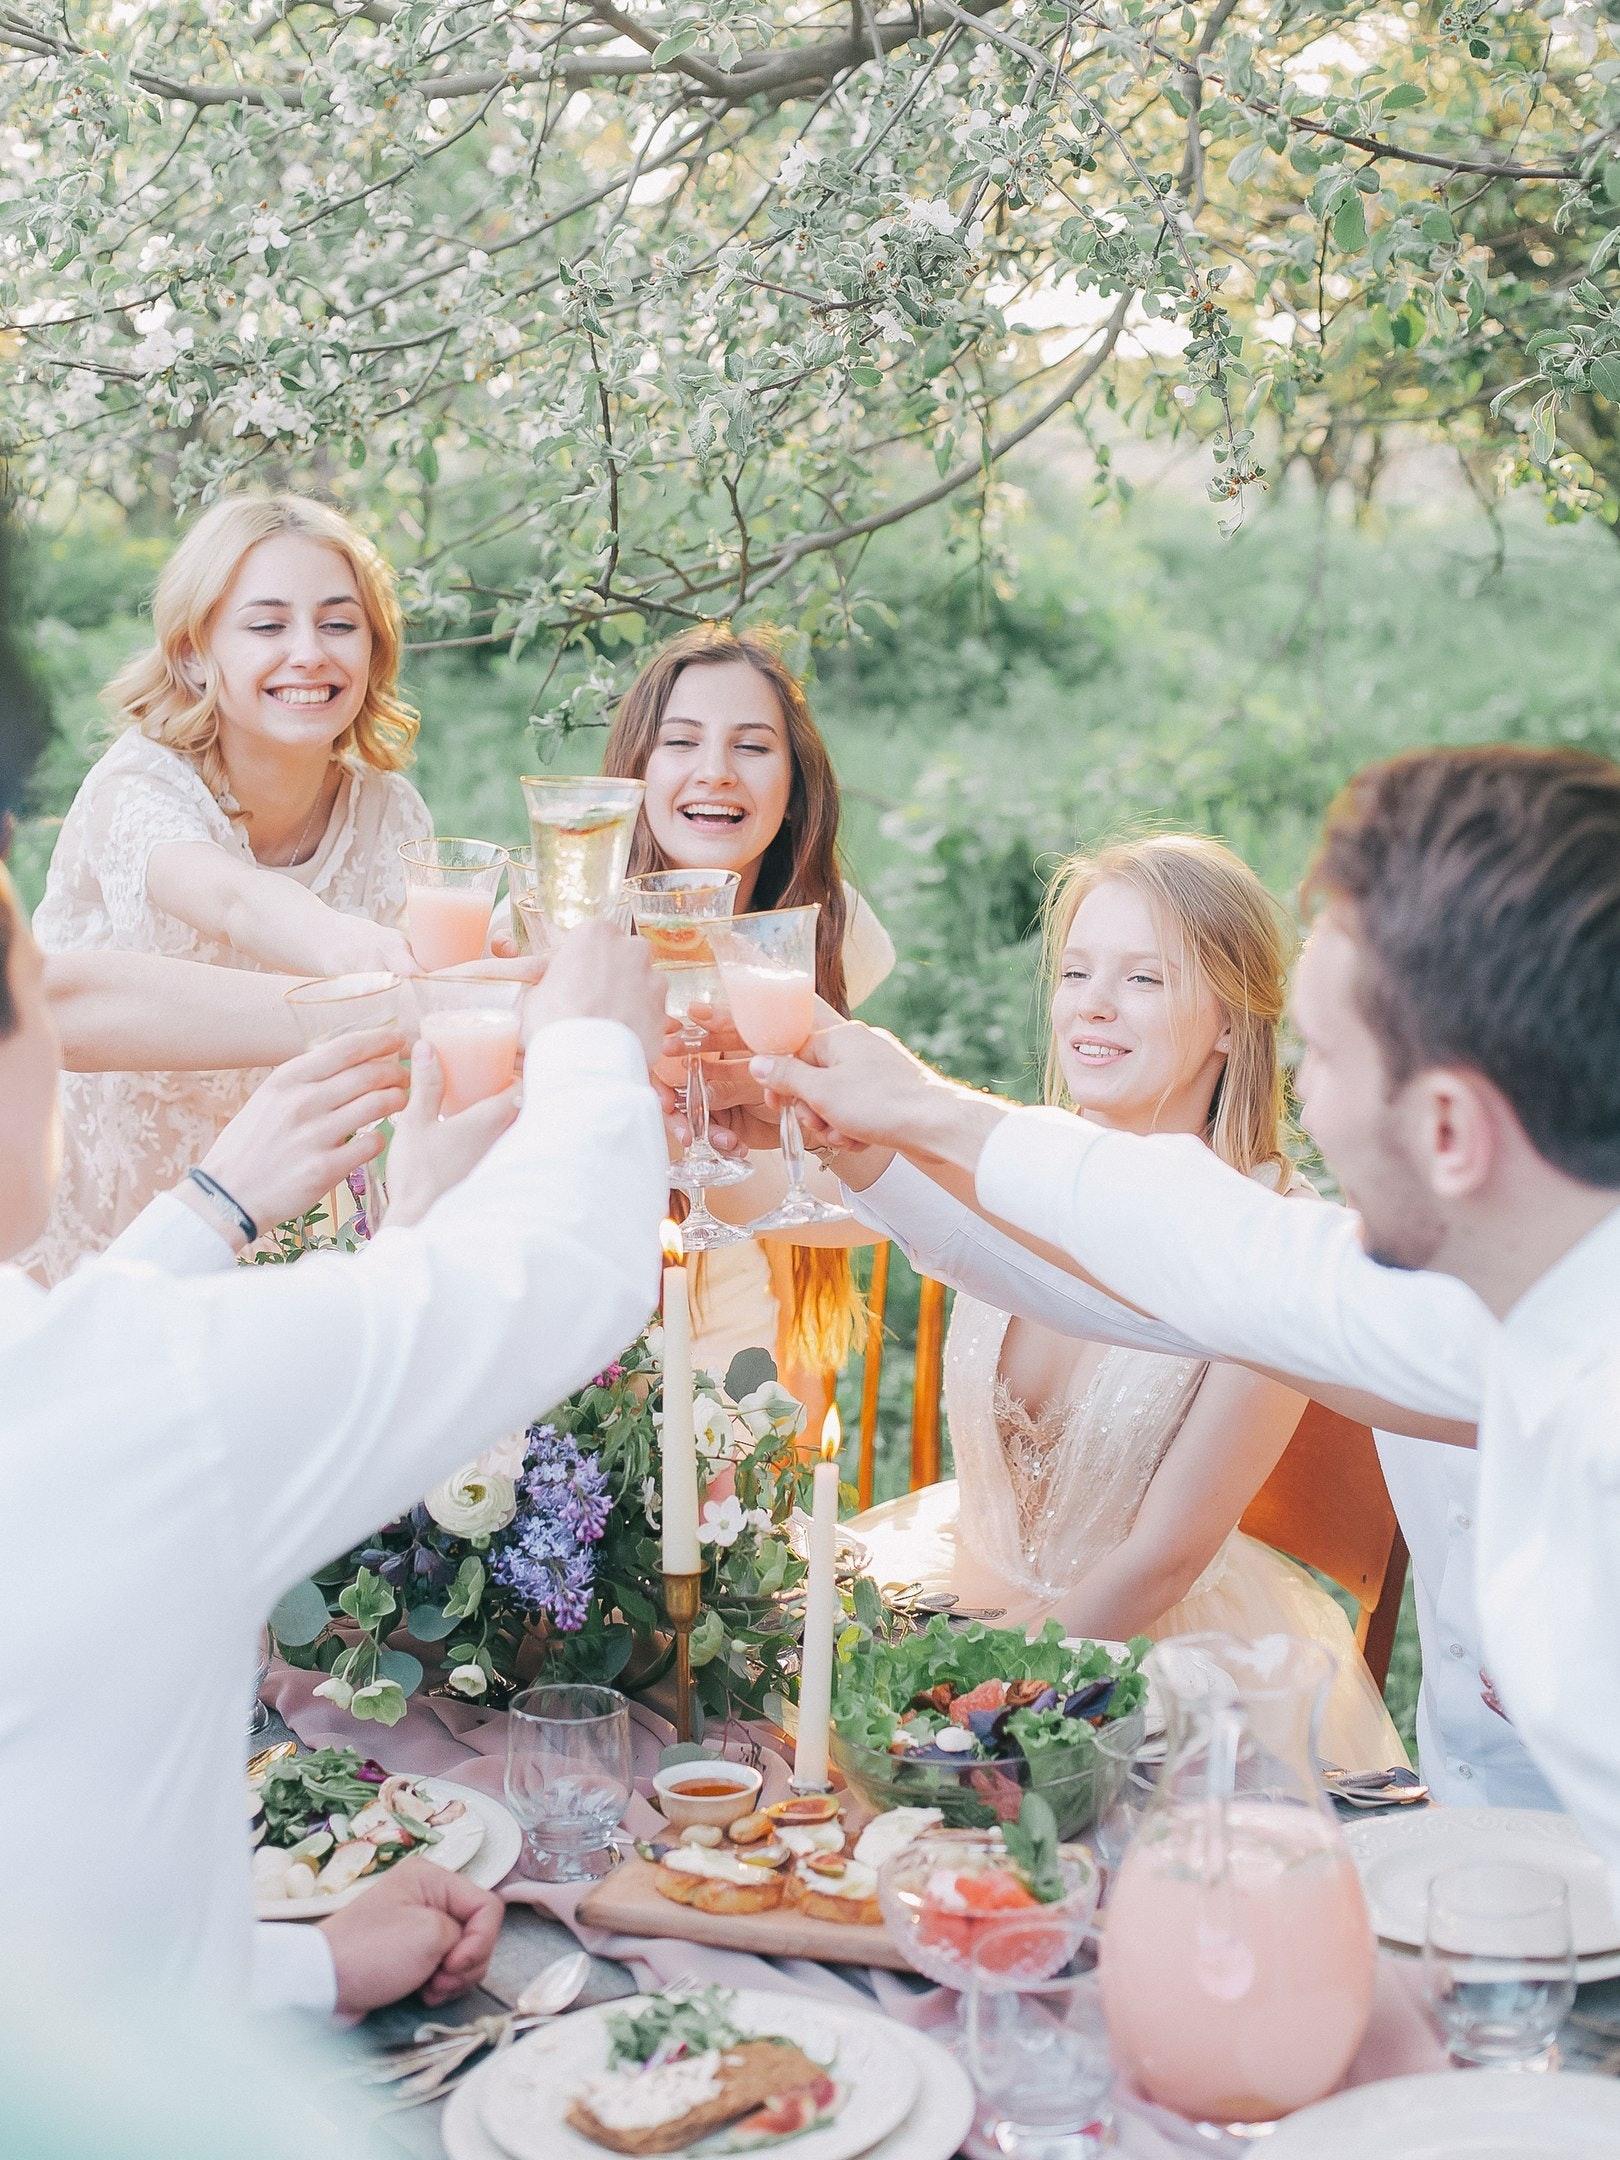 adult-celebration-cheers-415318.jpg